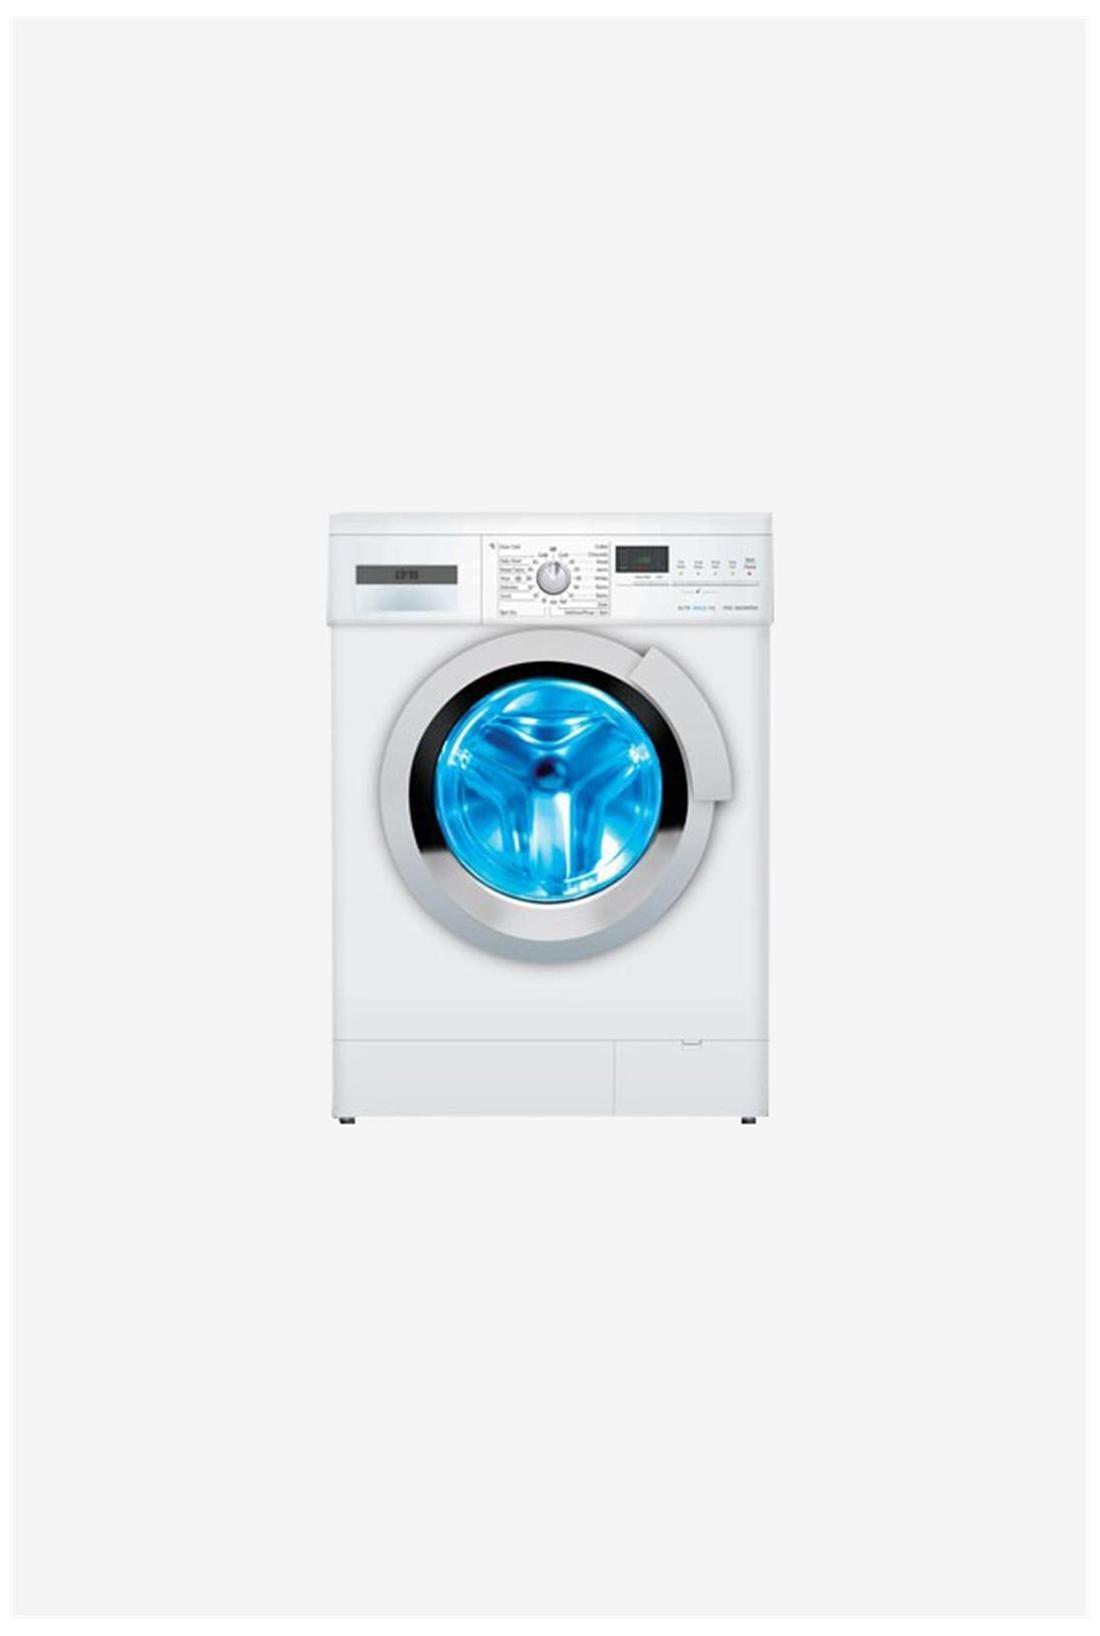 IFB ELITE AQUA VX 7KG Fully Automatic Front Load Washing Machine